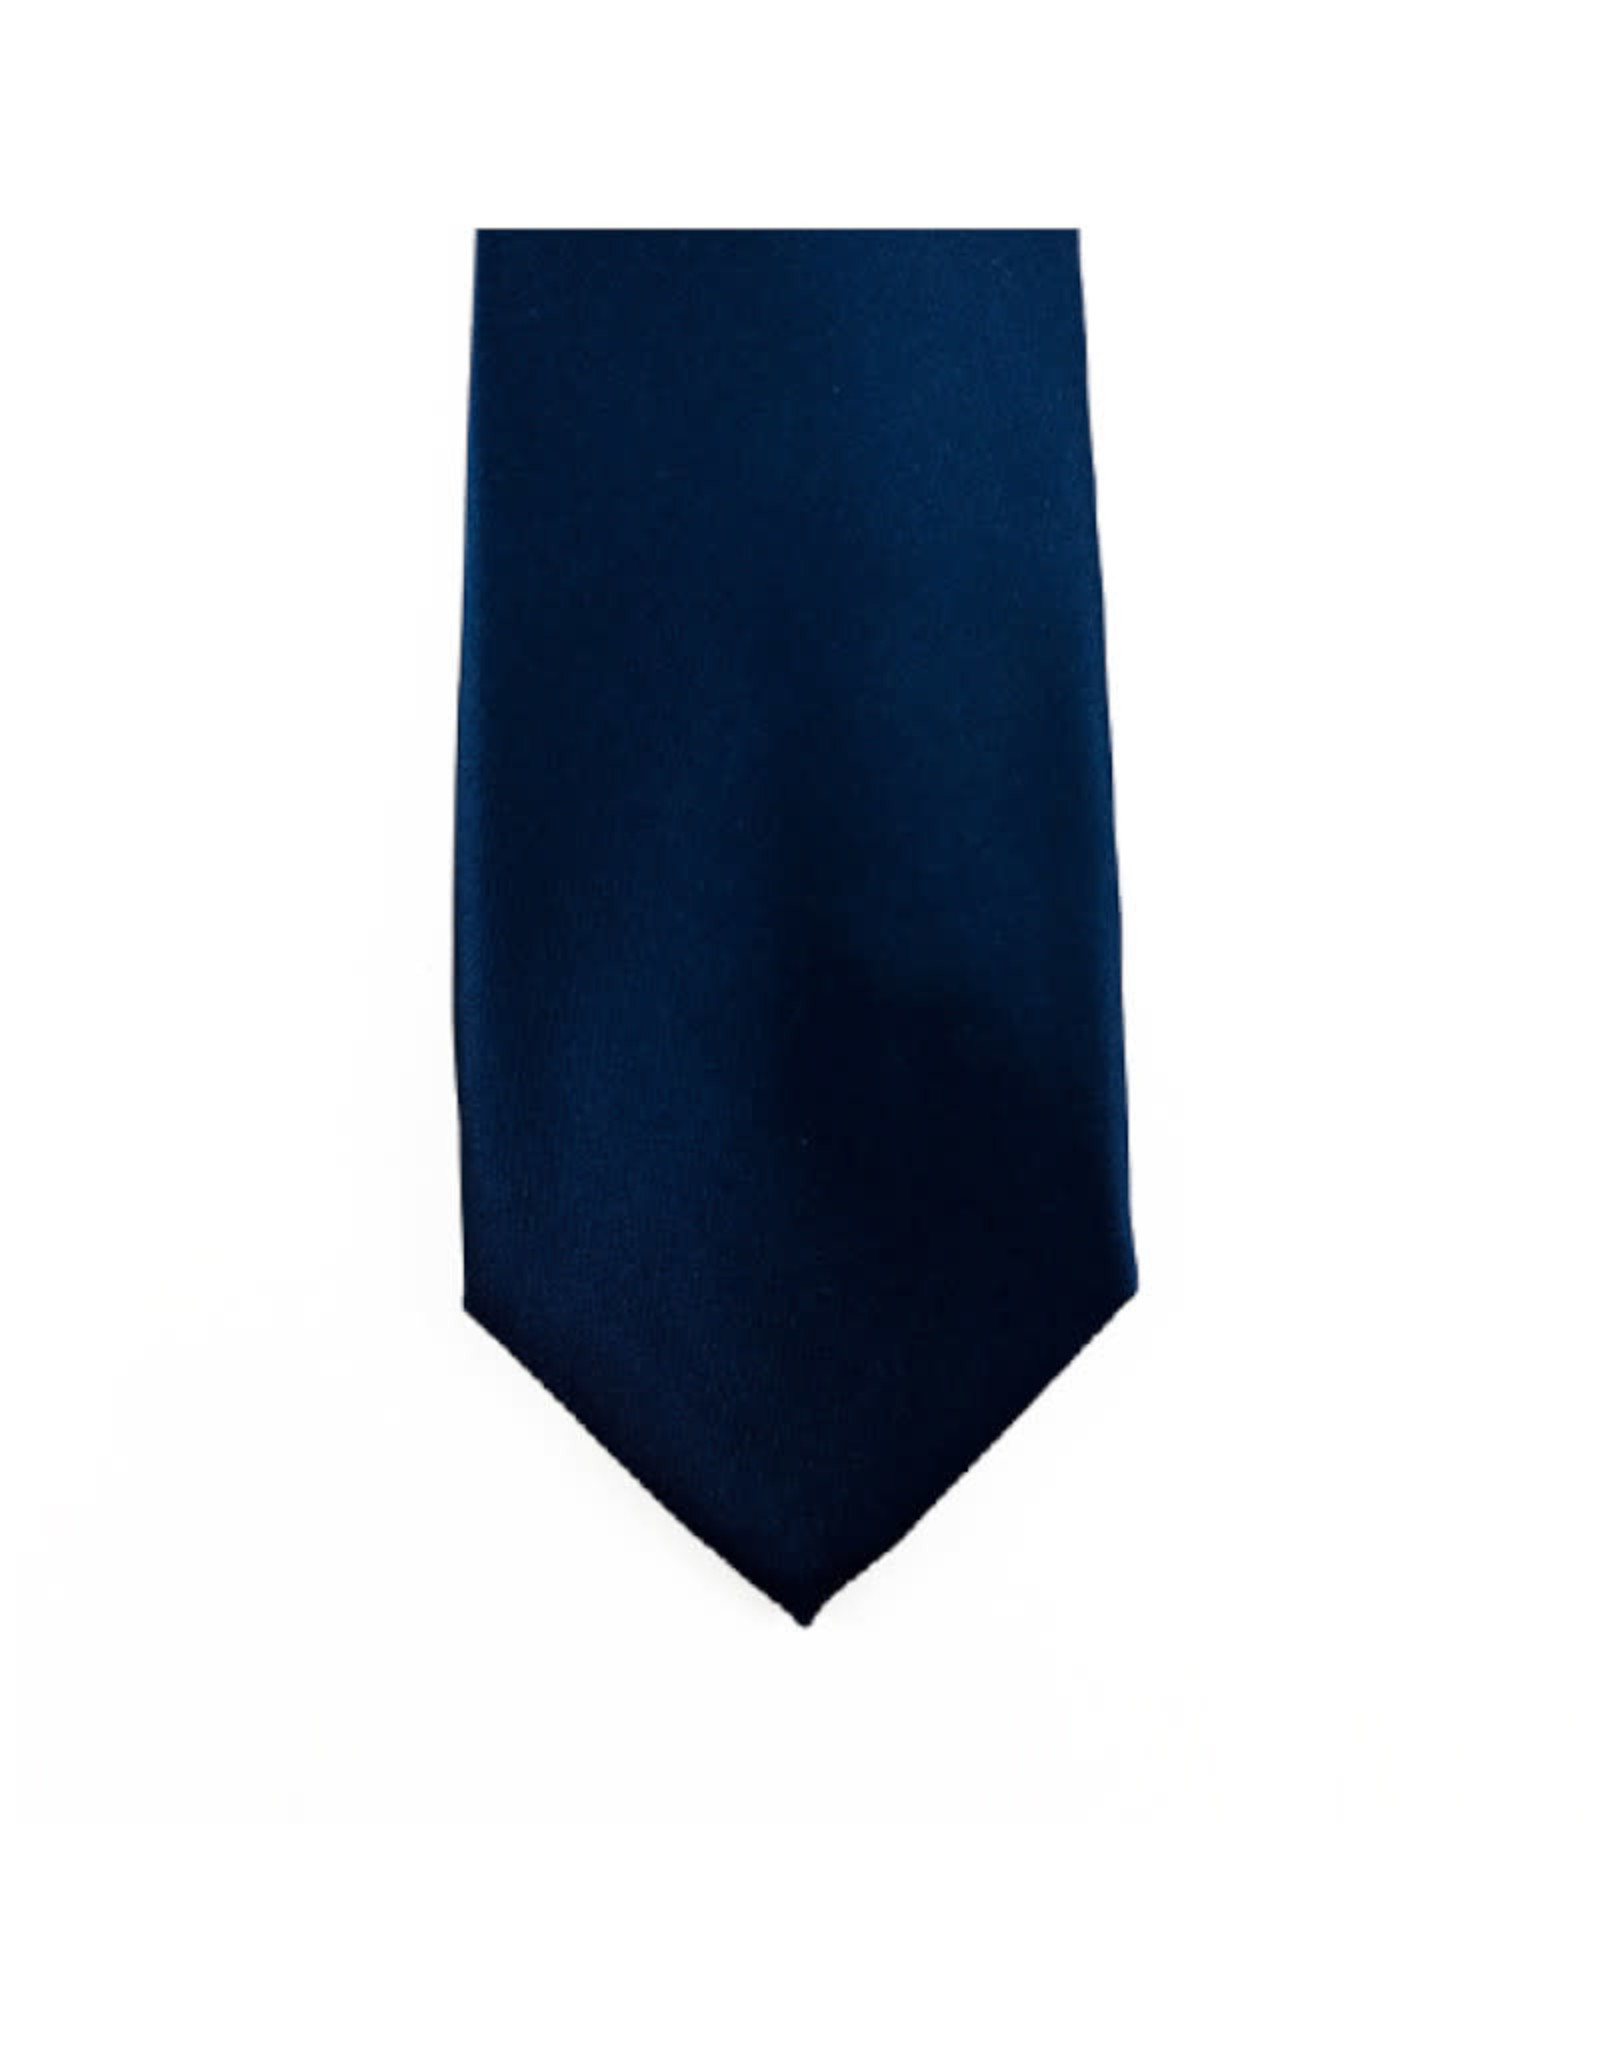 Knotz M100 Solid Tie 1-10